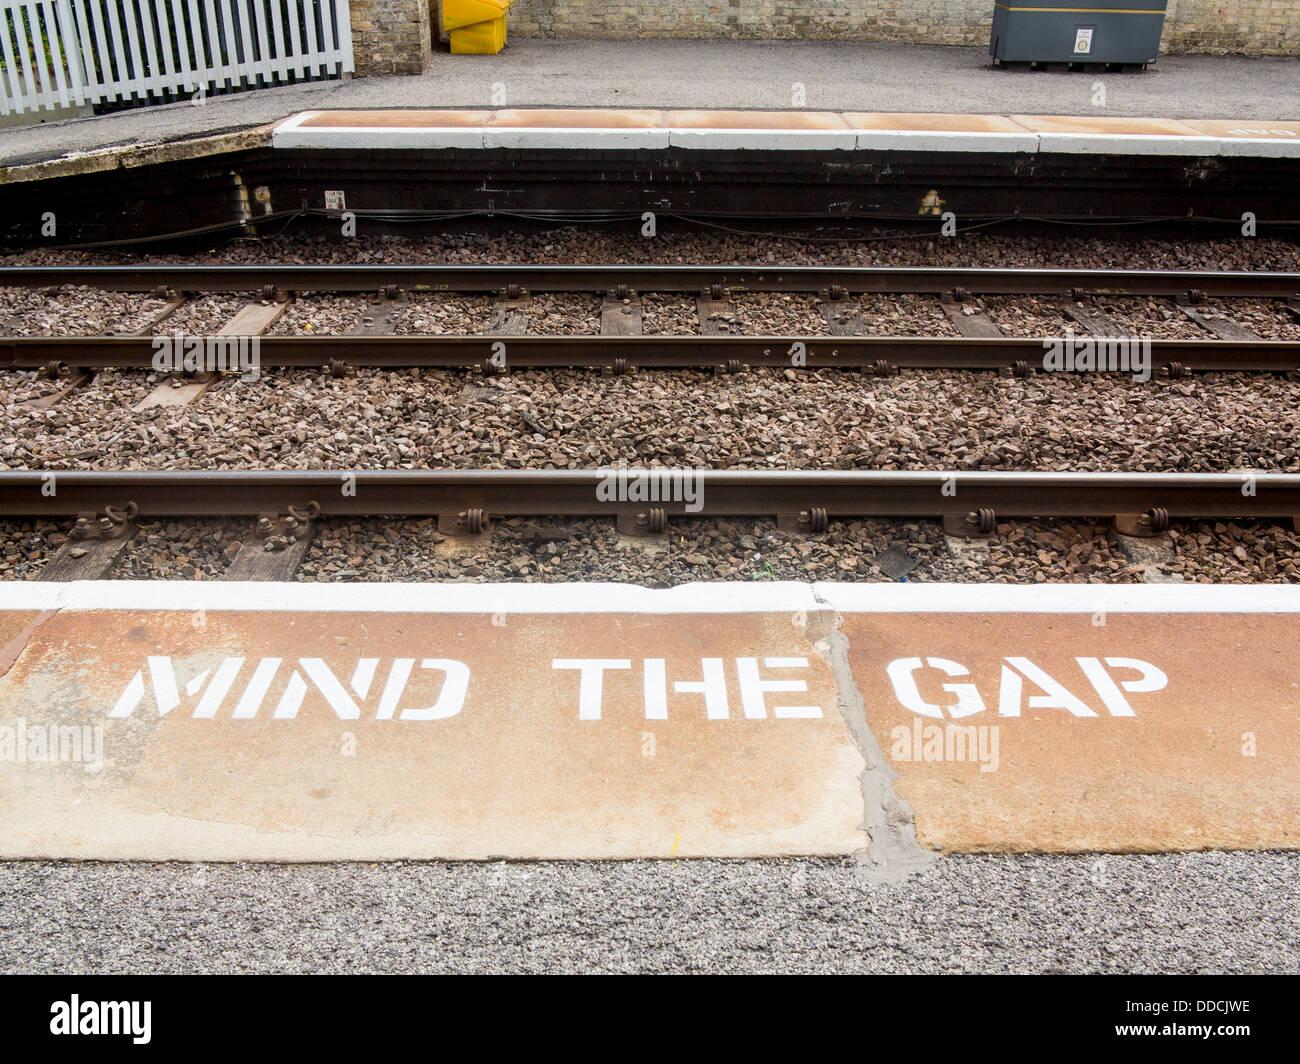 Mind the gap sign on railway station platform - Stock Image